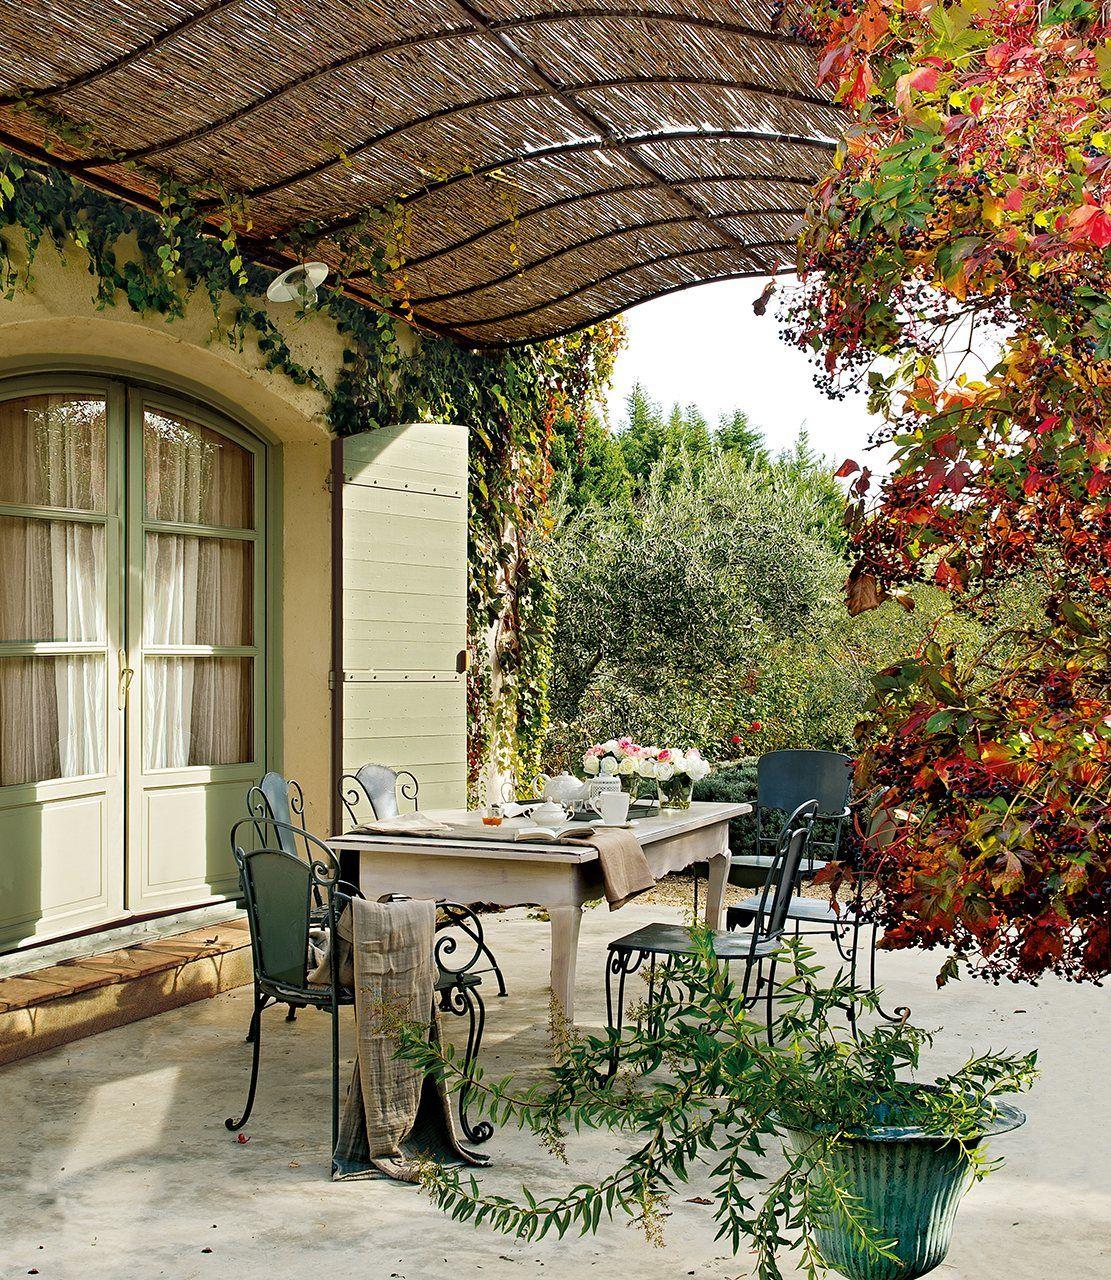 Una Vieja Casa De Huespedes En La Provenza Jardines Jardines Al Aire Libre Sala De Exterior